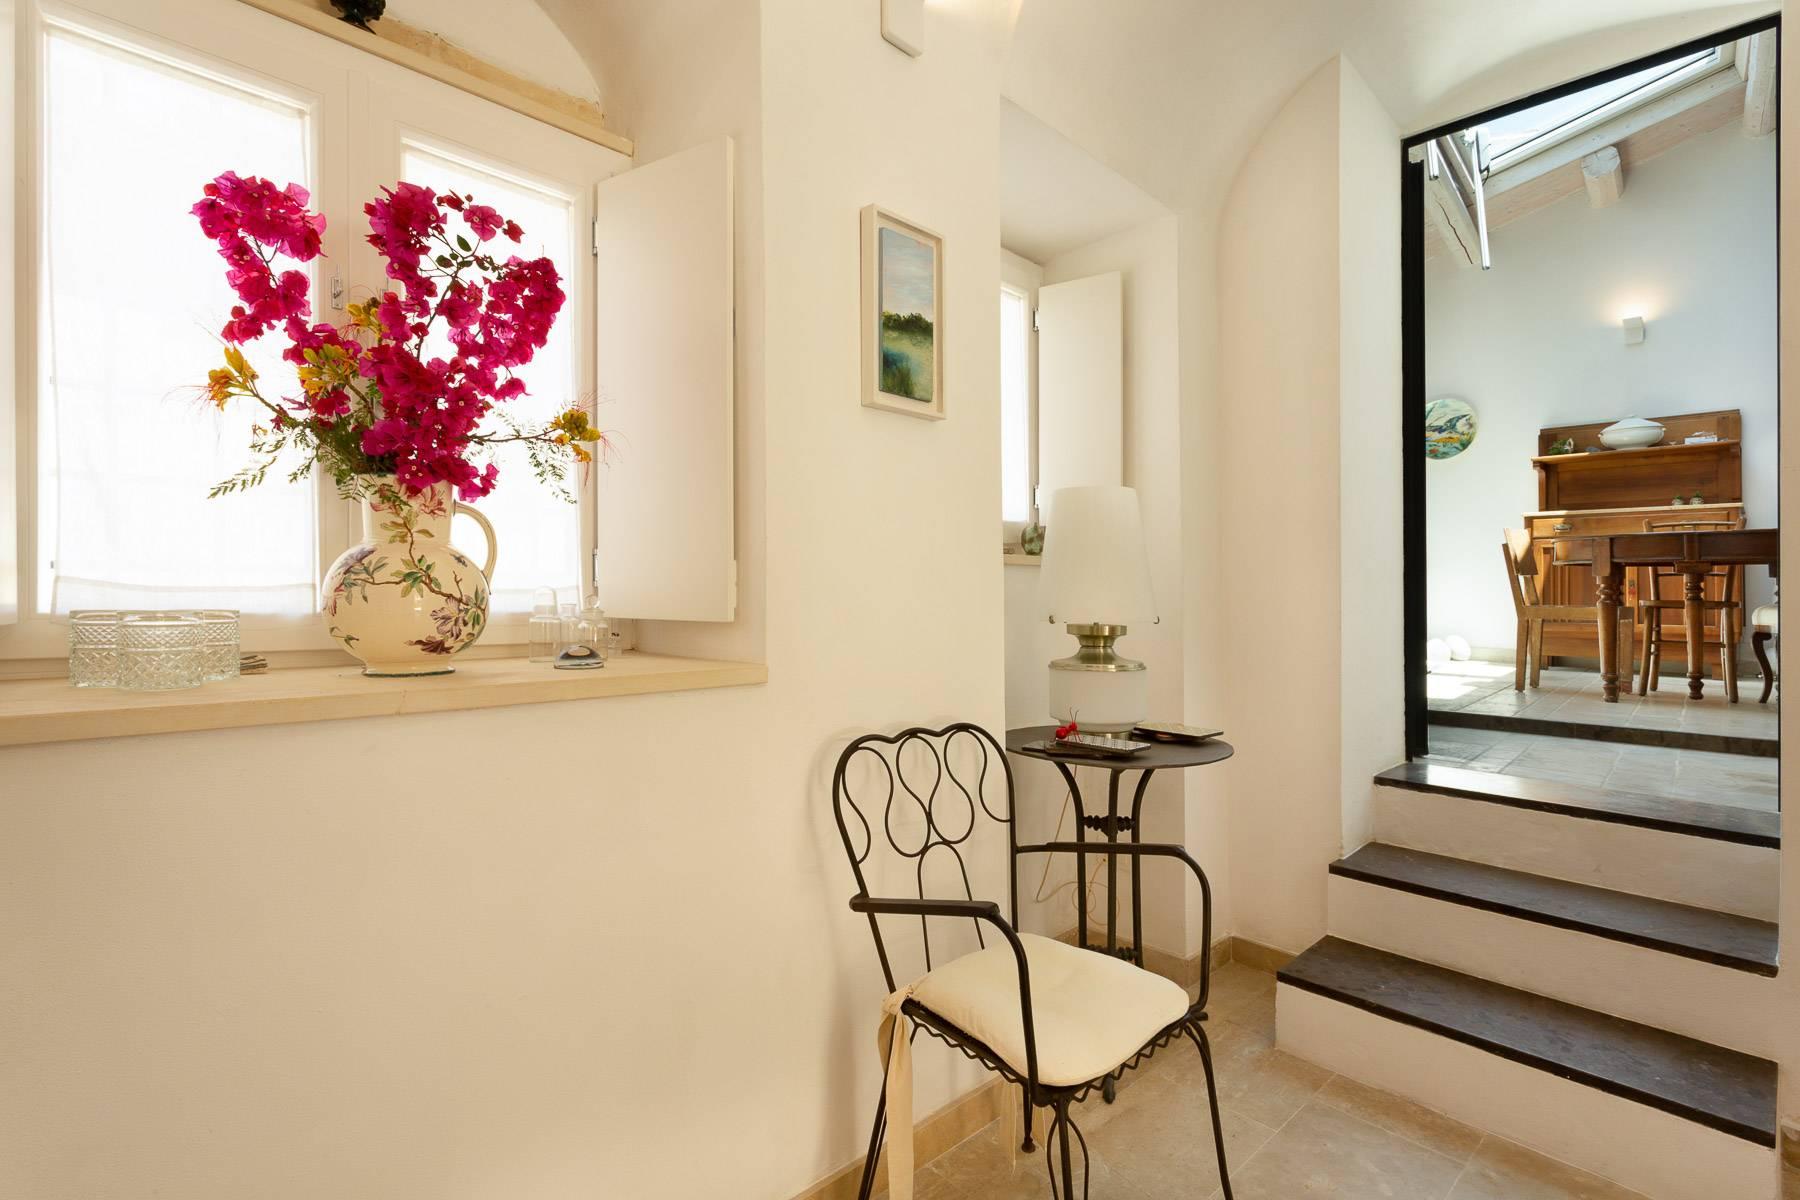 Casa indipendente in Vendita a Noto: 5 locali, 171 mq - Foto 2